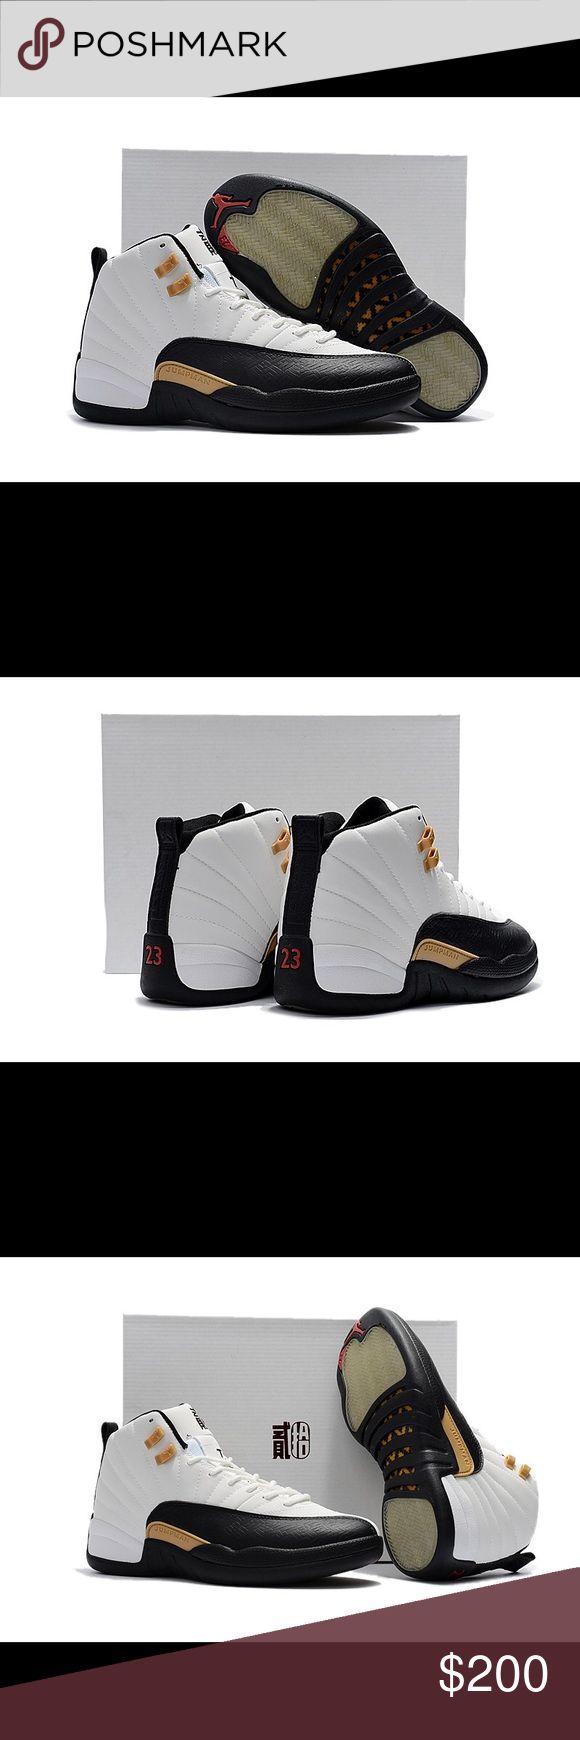 Men's Nike Air Jordan 12 CNY Men's Nike Air Jordan 12 CNY Air Jordan Shoes Sneakers